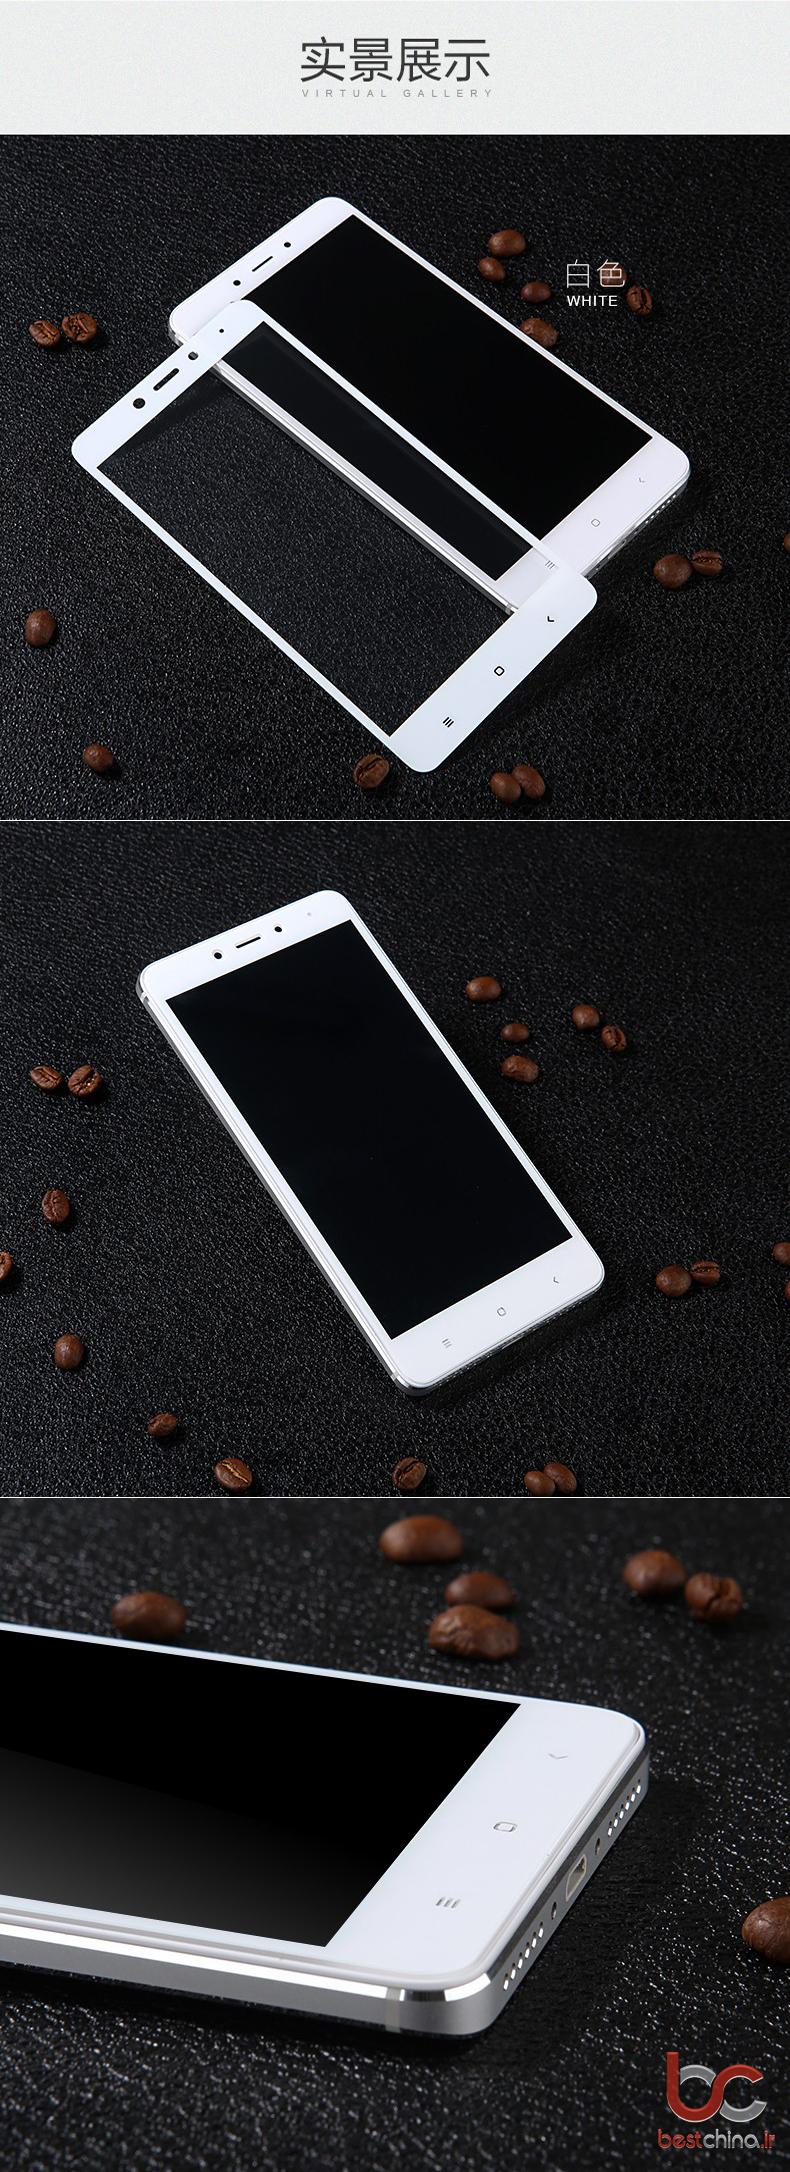 xiaomi-redmi-note-4-full-cover-glass-screen-protector-2